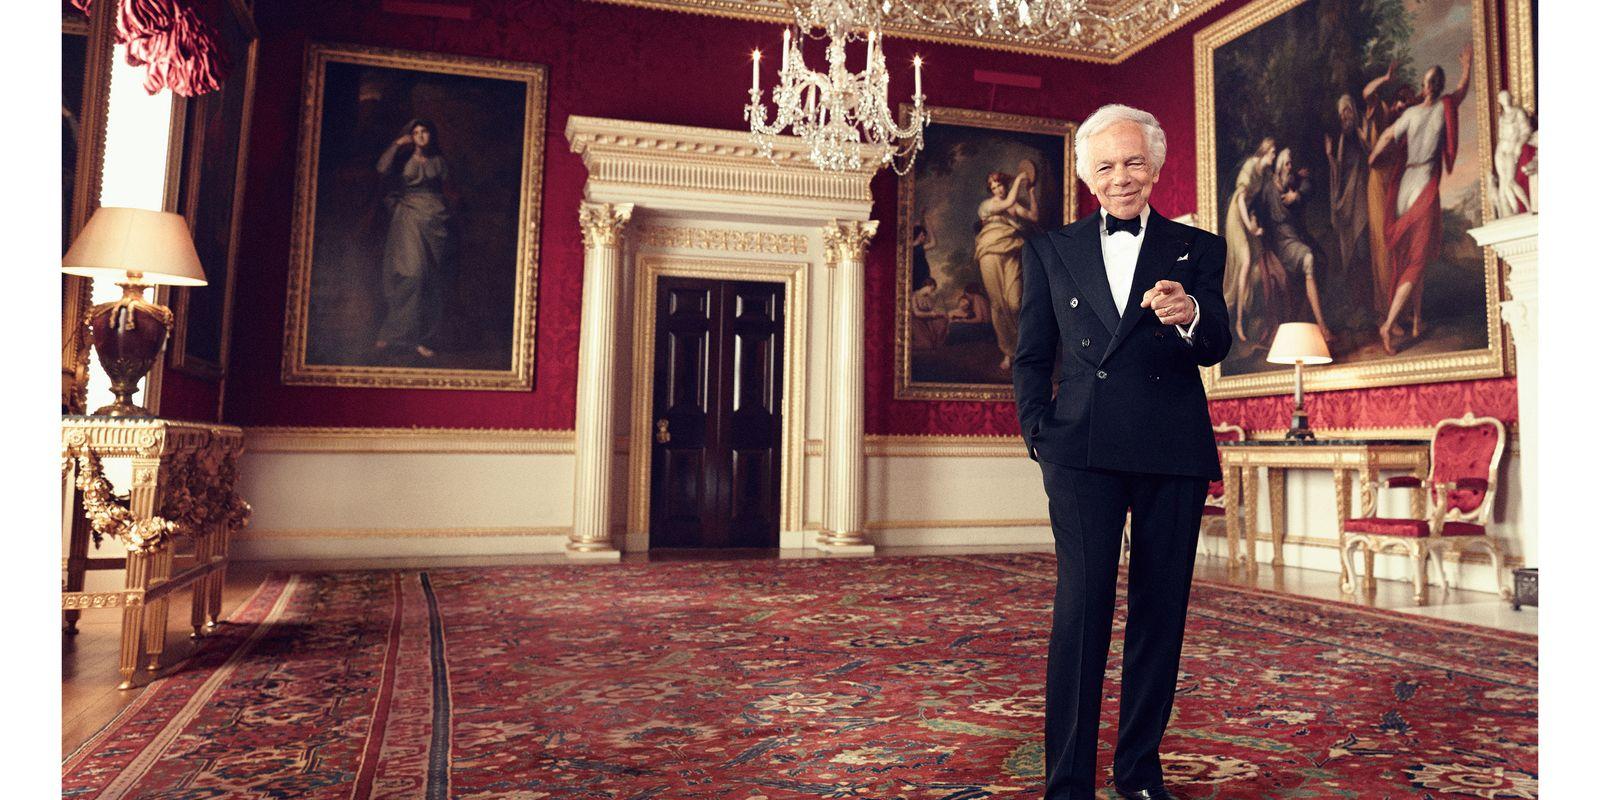 Ralph Lauren Dines with Prince William at Windsor Castle \\u2013 Ralph Lauren Breast Cancer Center